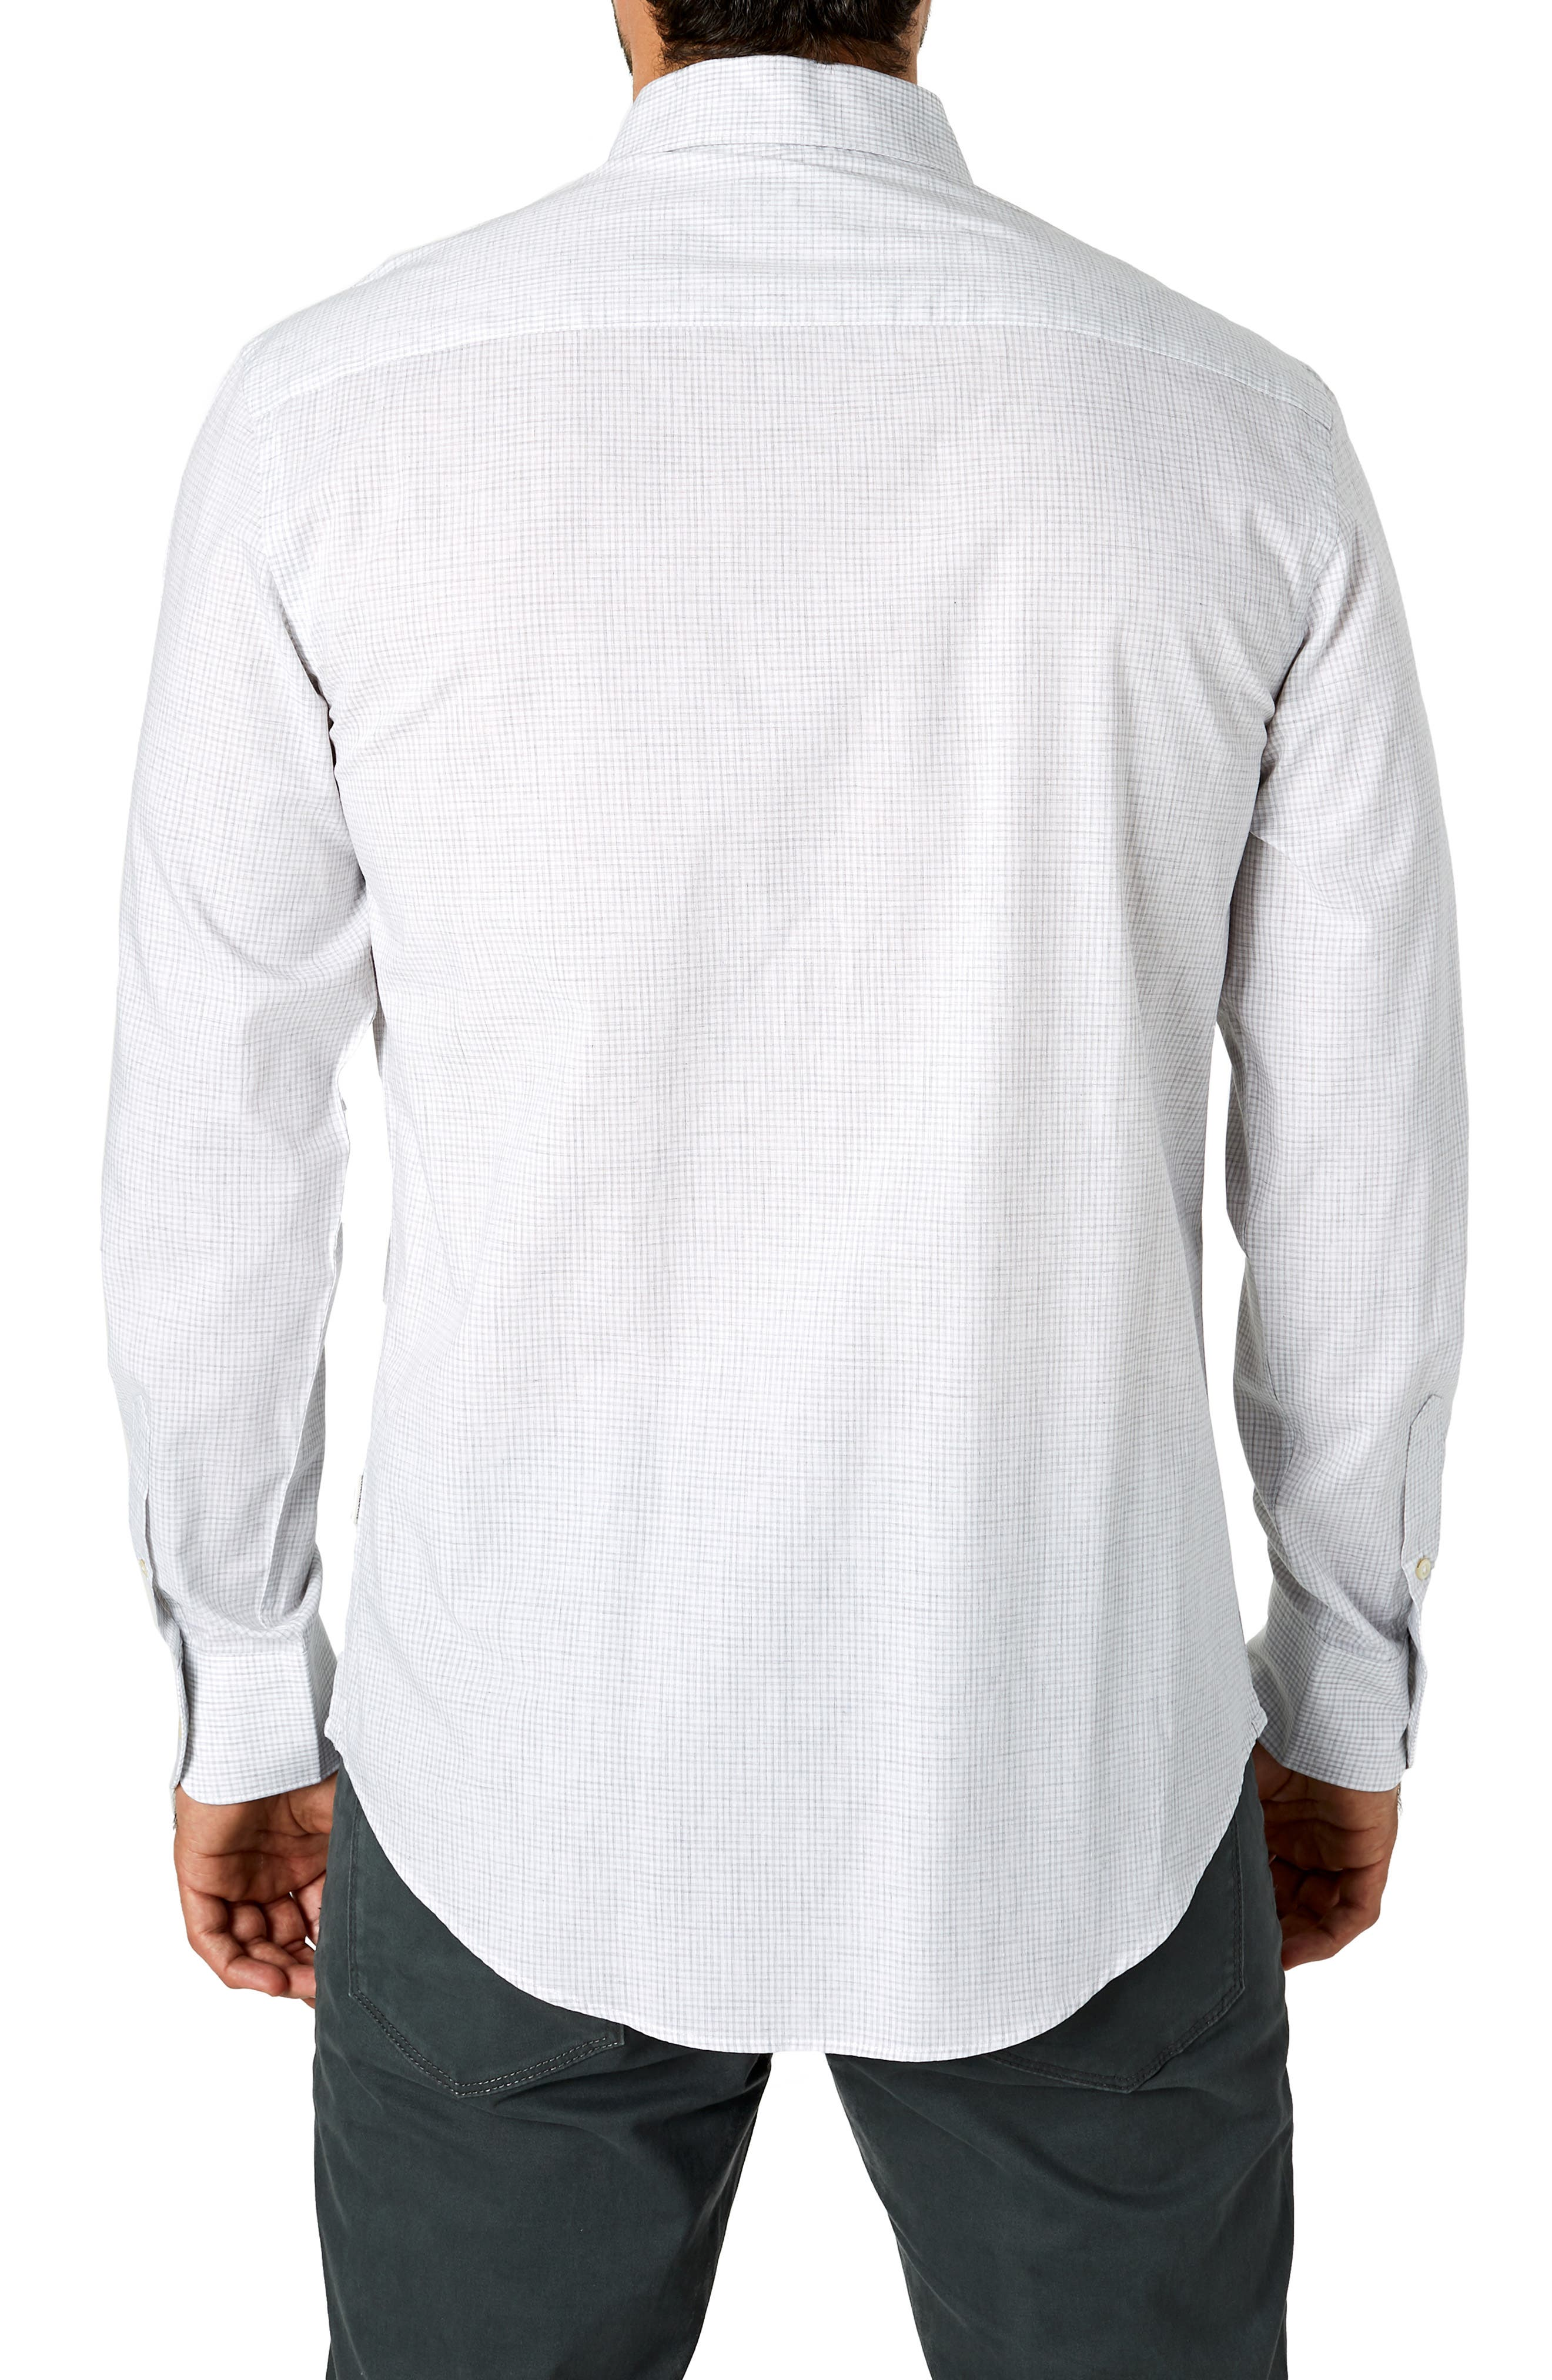 South London Trim Fit Check Sport Shirt,                             Alternate thumbnail 3, color,                             451